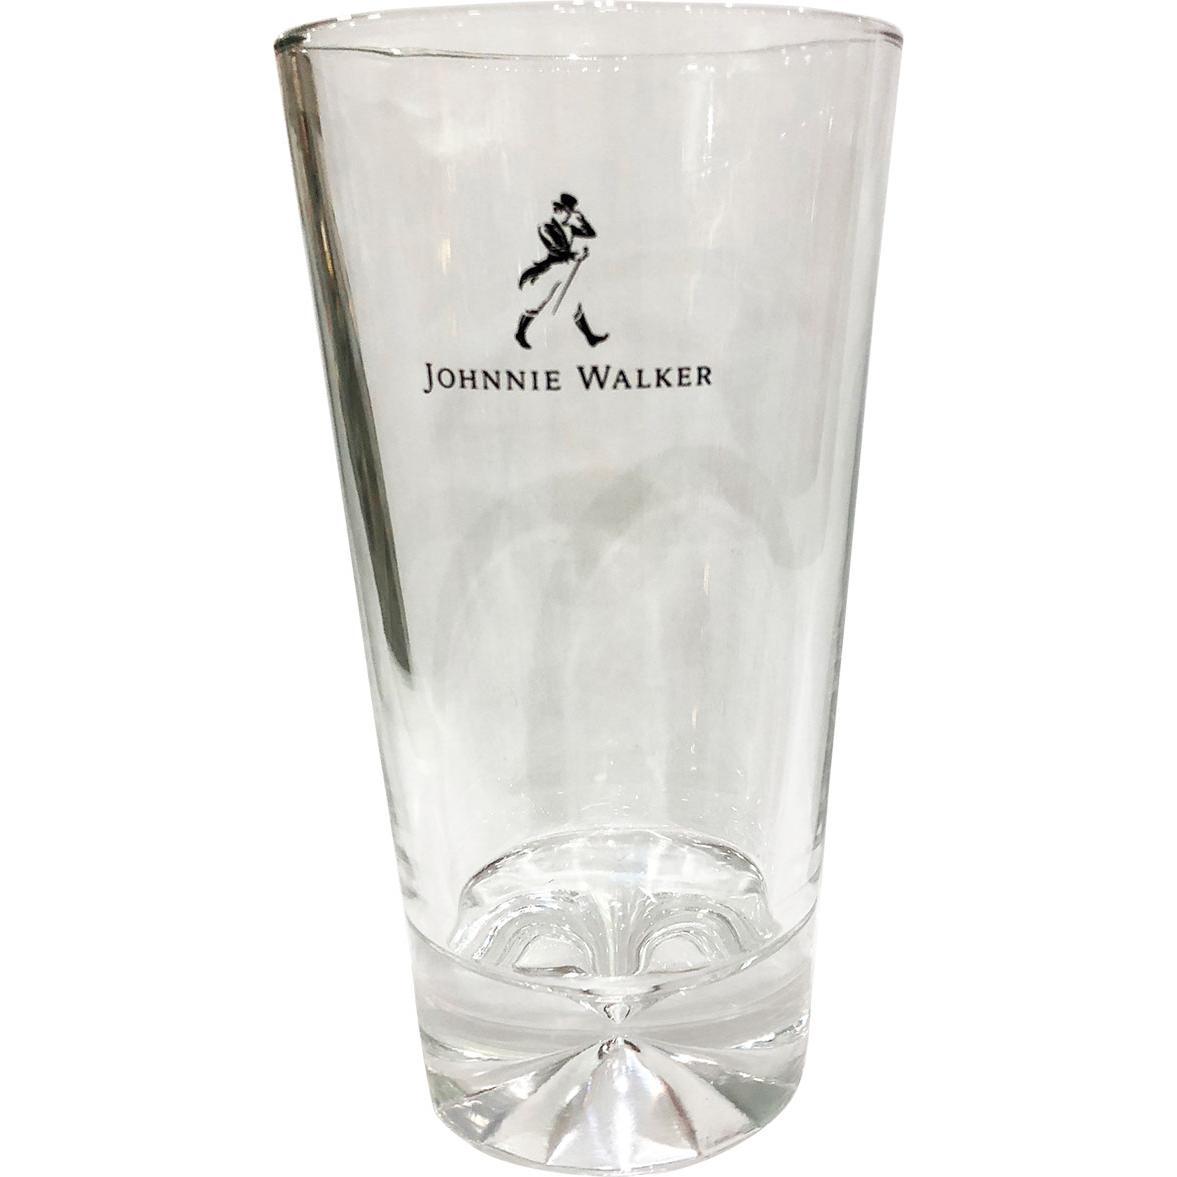 be72859cf9083 Johnnie Walker Red Label 2 Bottles + 4 Glasses - Buy Whisky - Scotch ...